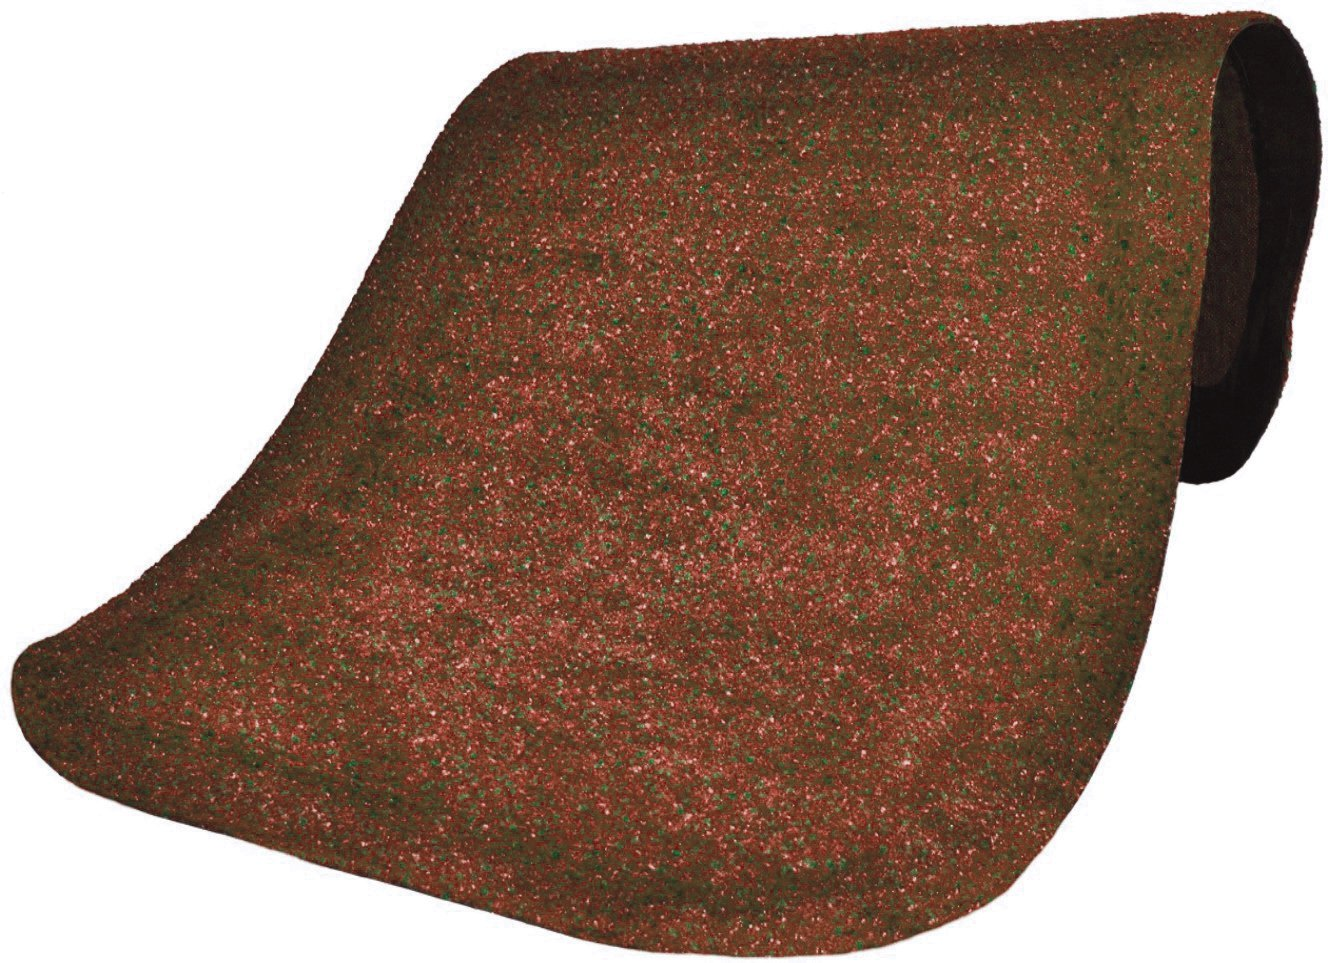 Andersen 446 Cinnamon Nylon Hog Heaven Plush Anti-Fatigue Mat, 5' Length x 3' Width x 5/8'' Thick, For Indoor